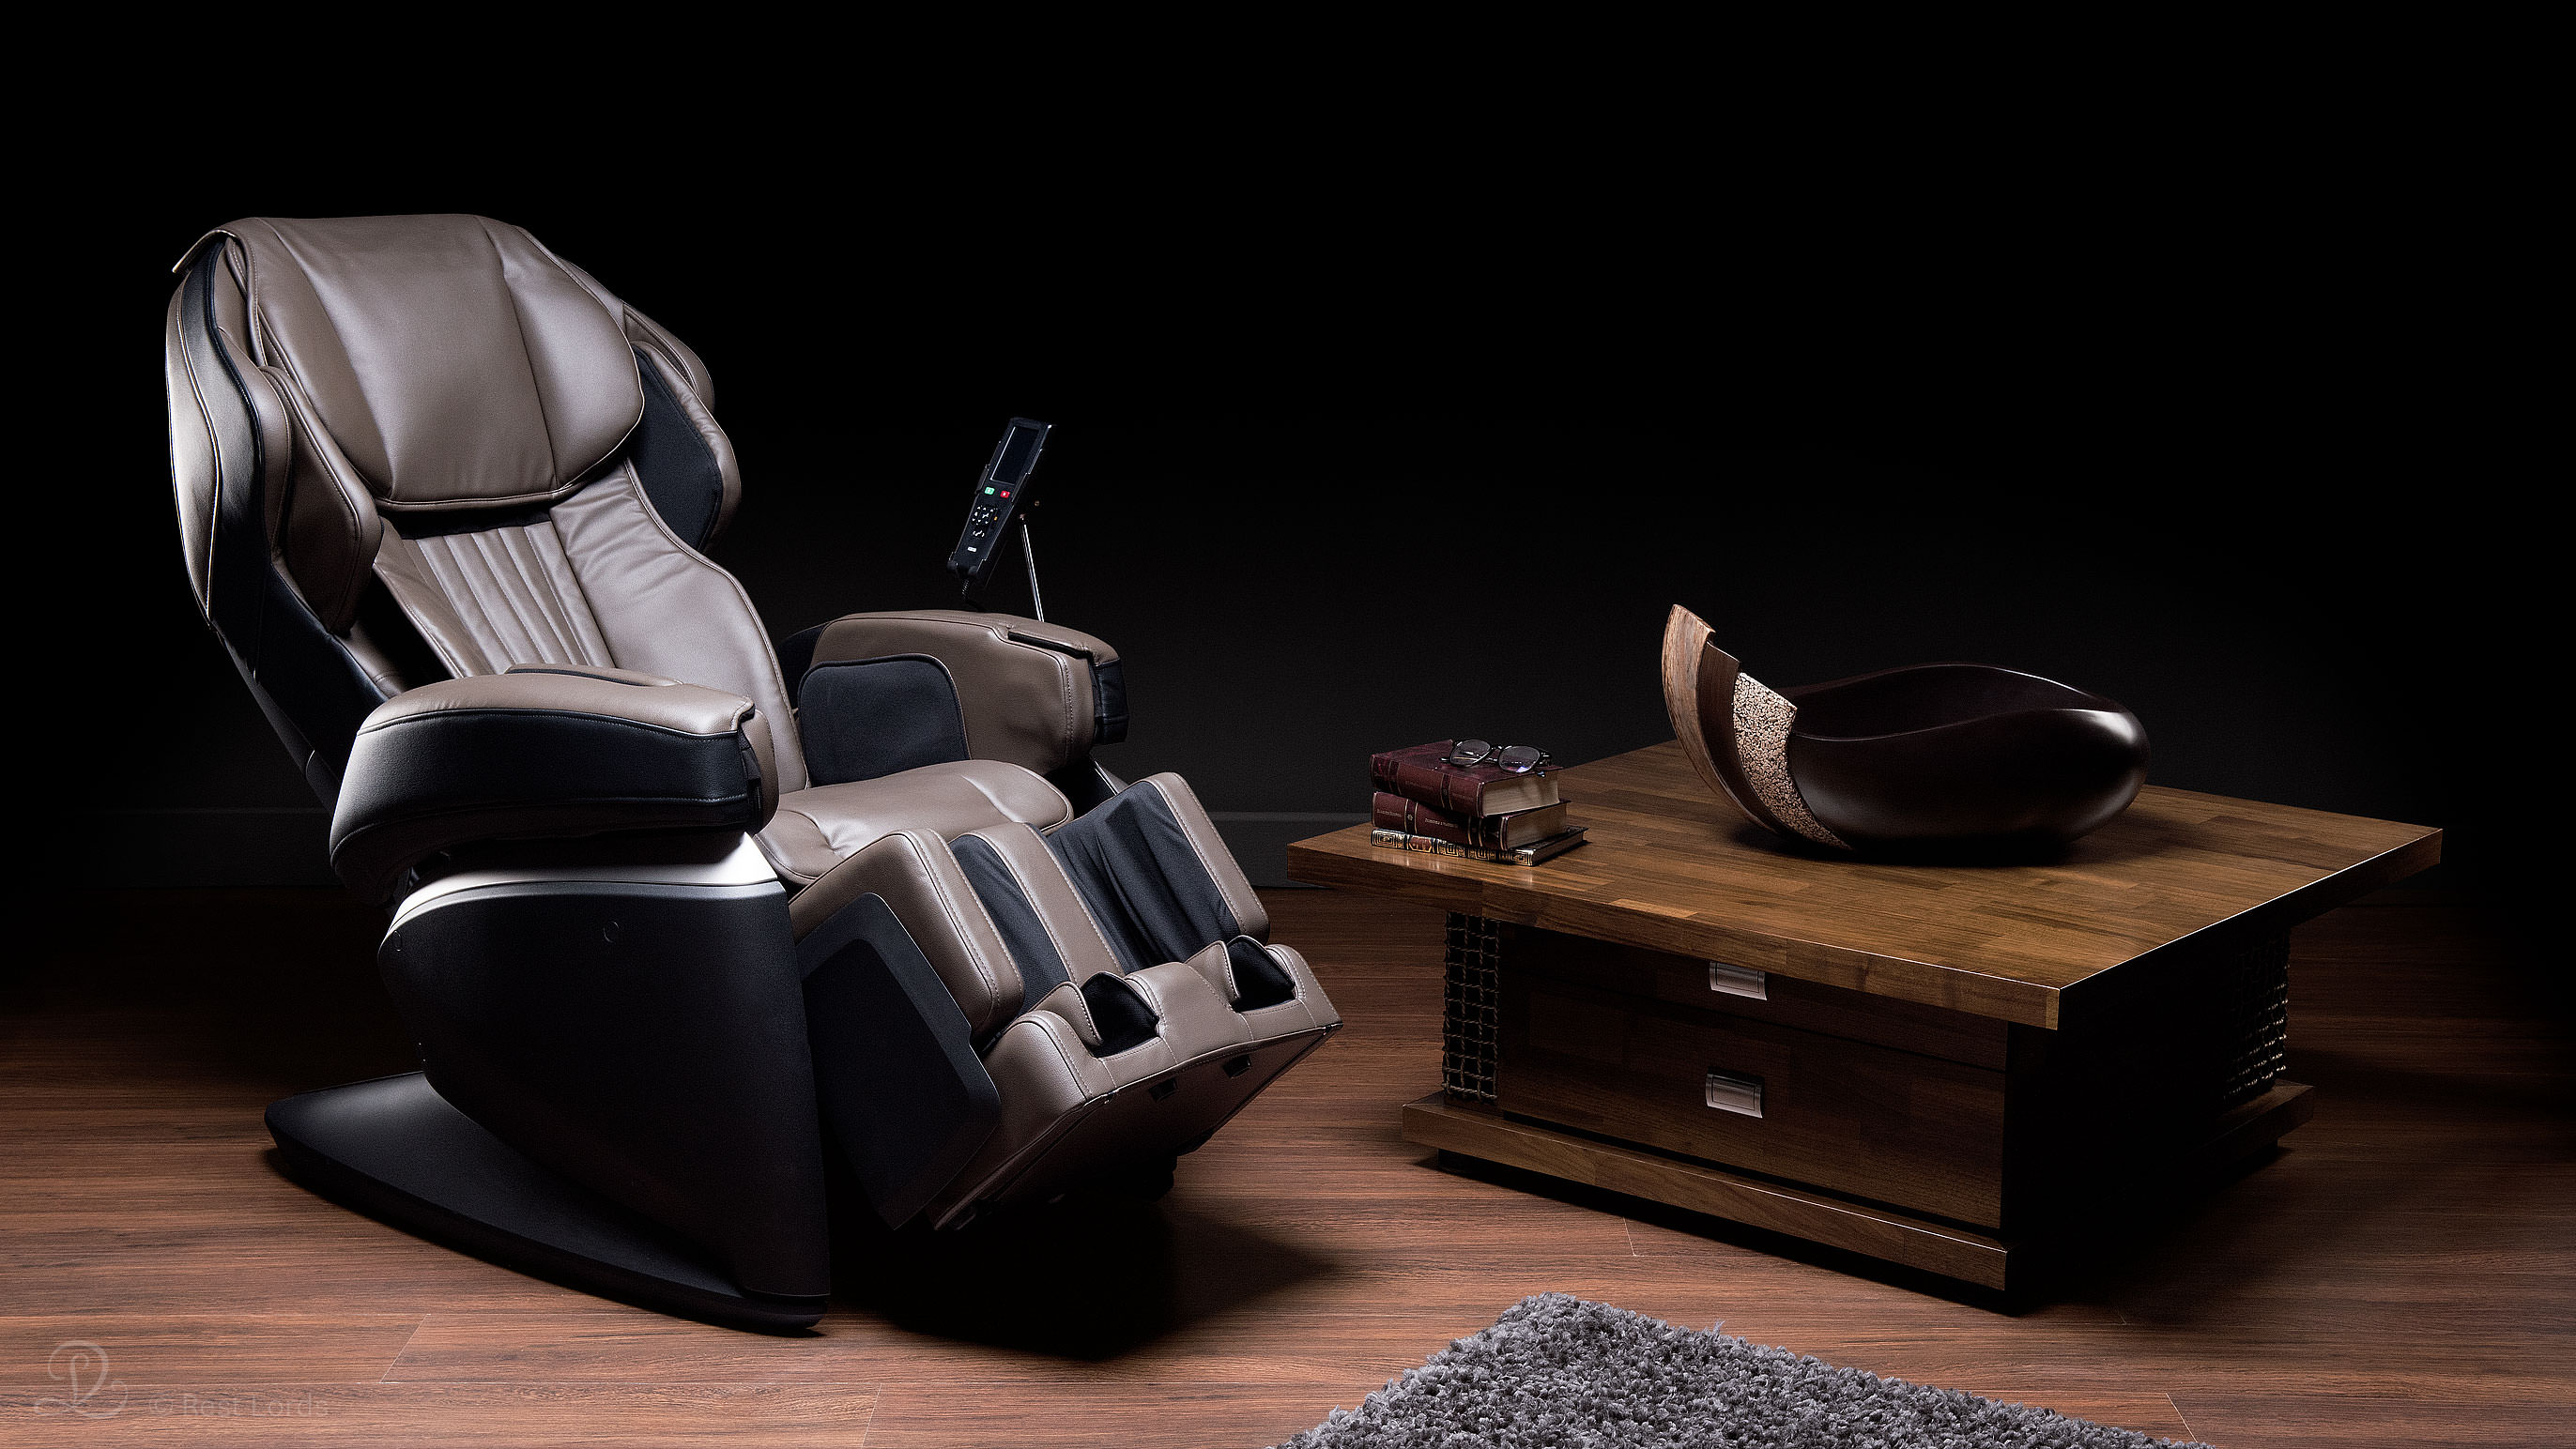 Massage chair Fujiiryoki JP1000 arrangement